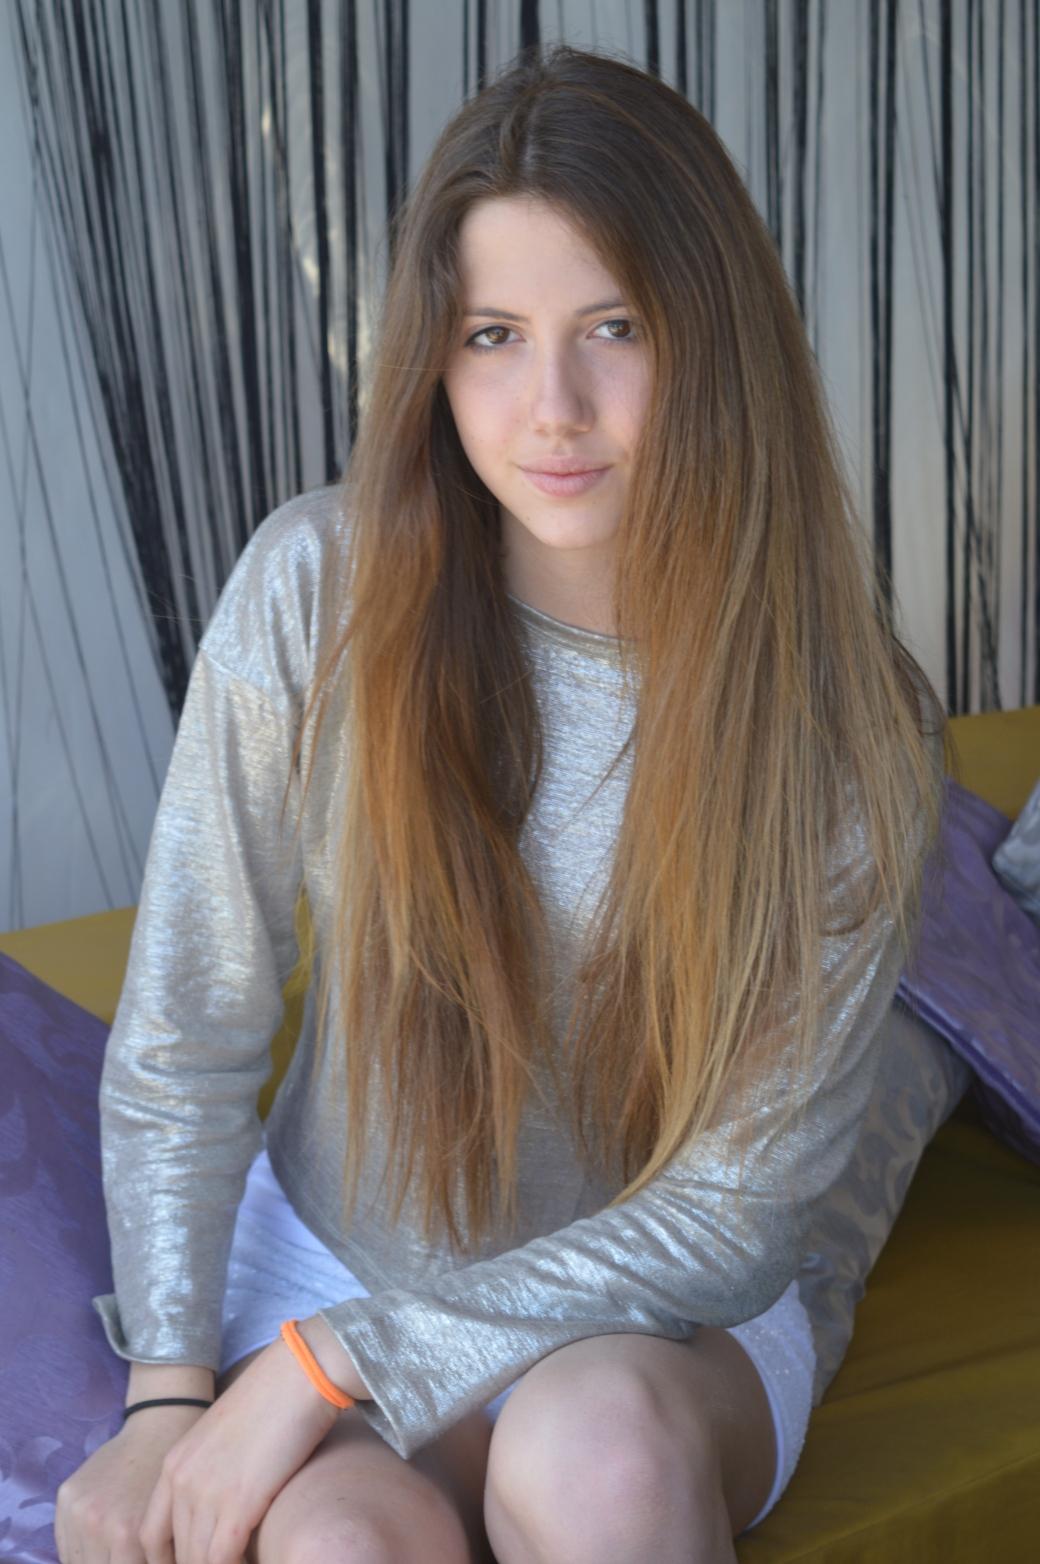 elisabeth puig begur tpl blog de moda infantil y juvenil